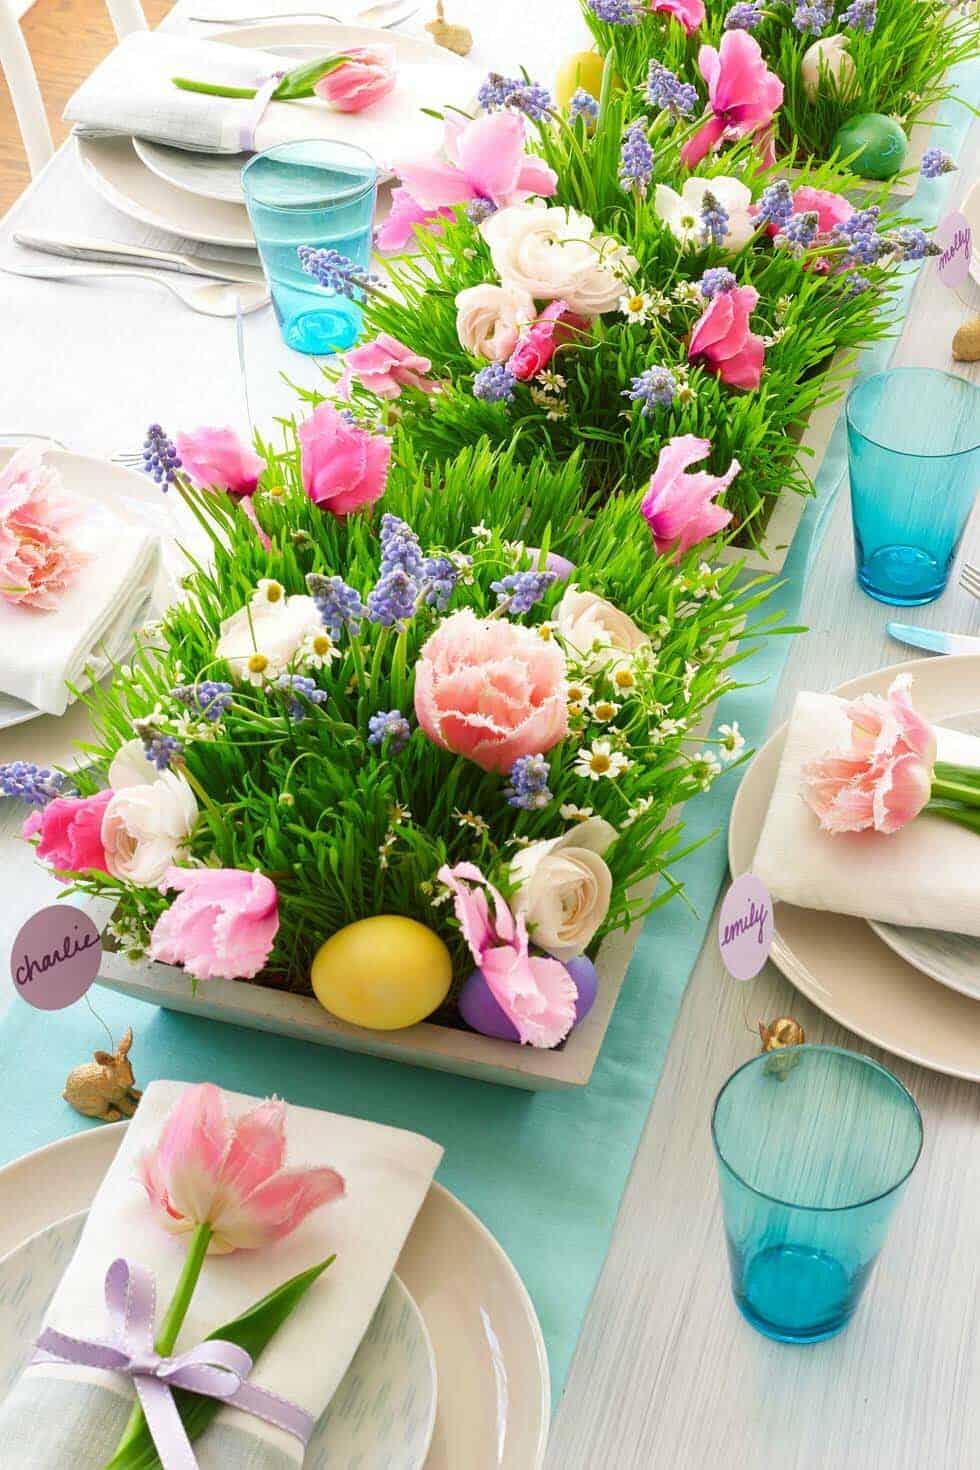 Inspiring Easter Table Centerpiece Ideas-22-1 Kindesign